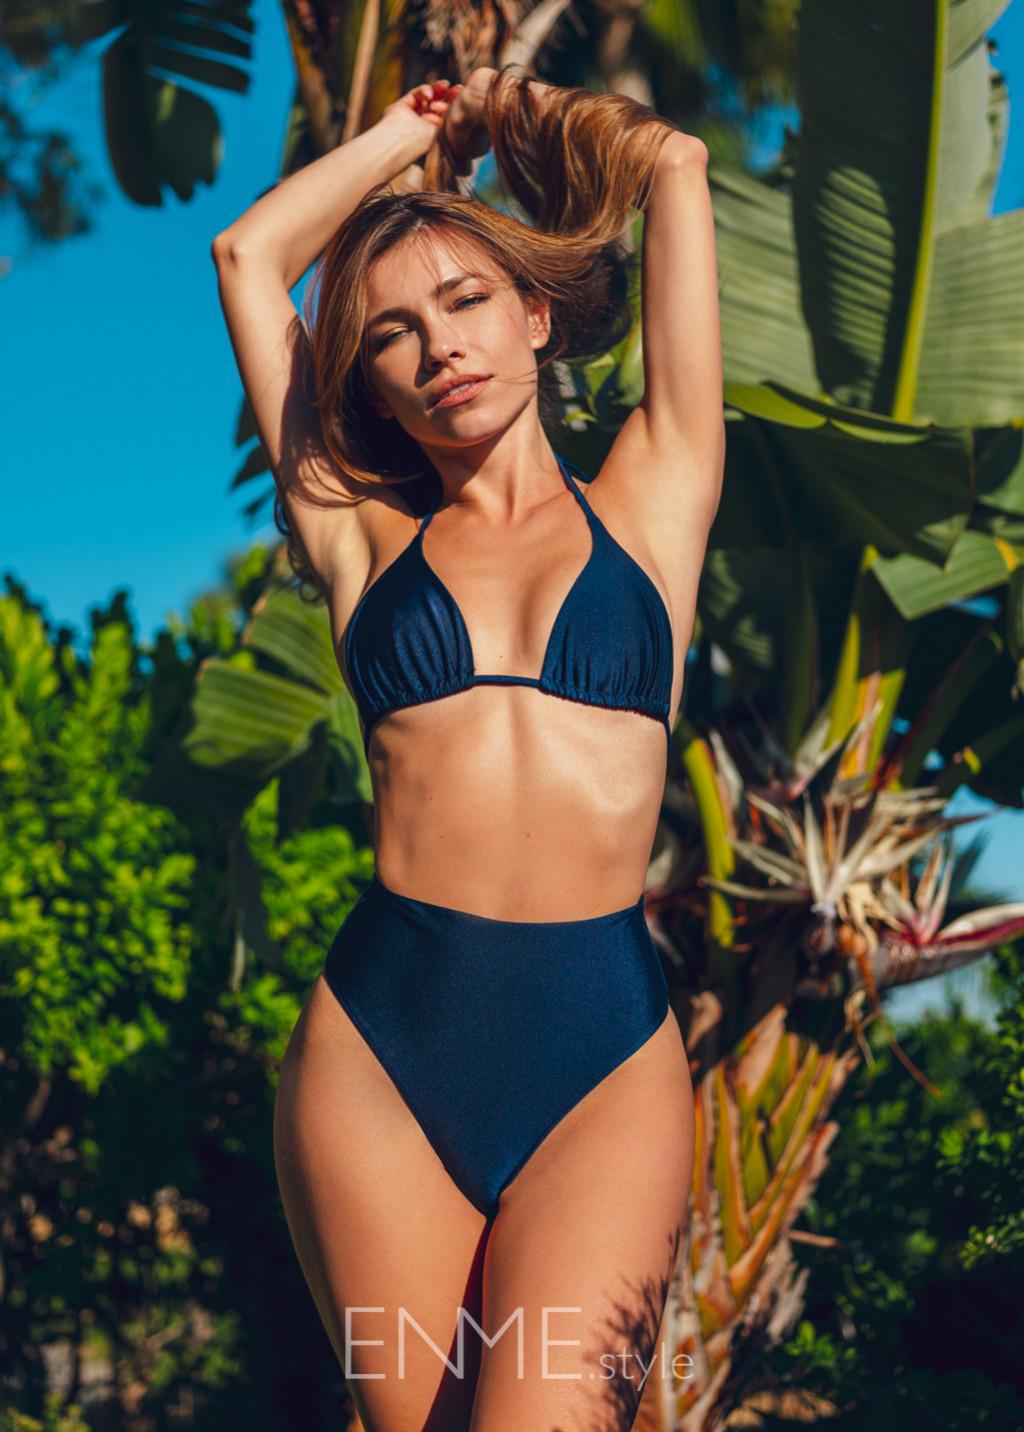 Navy Blue Slide Triangle Top And High-leg High Waist Bikini